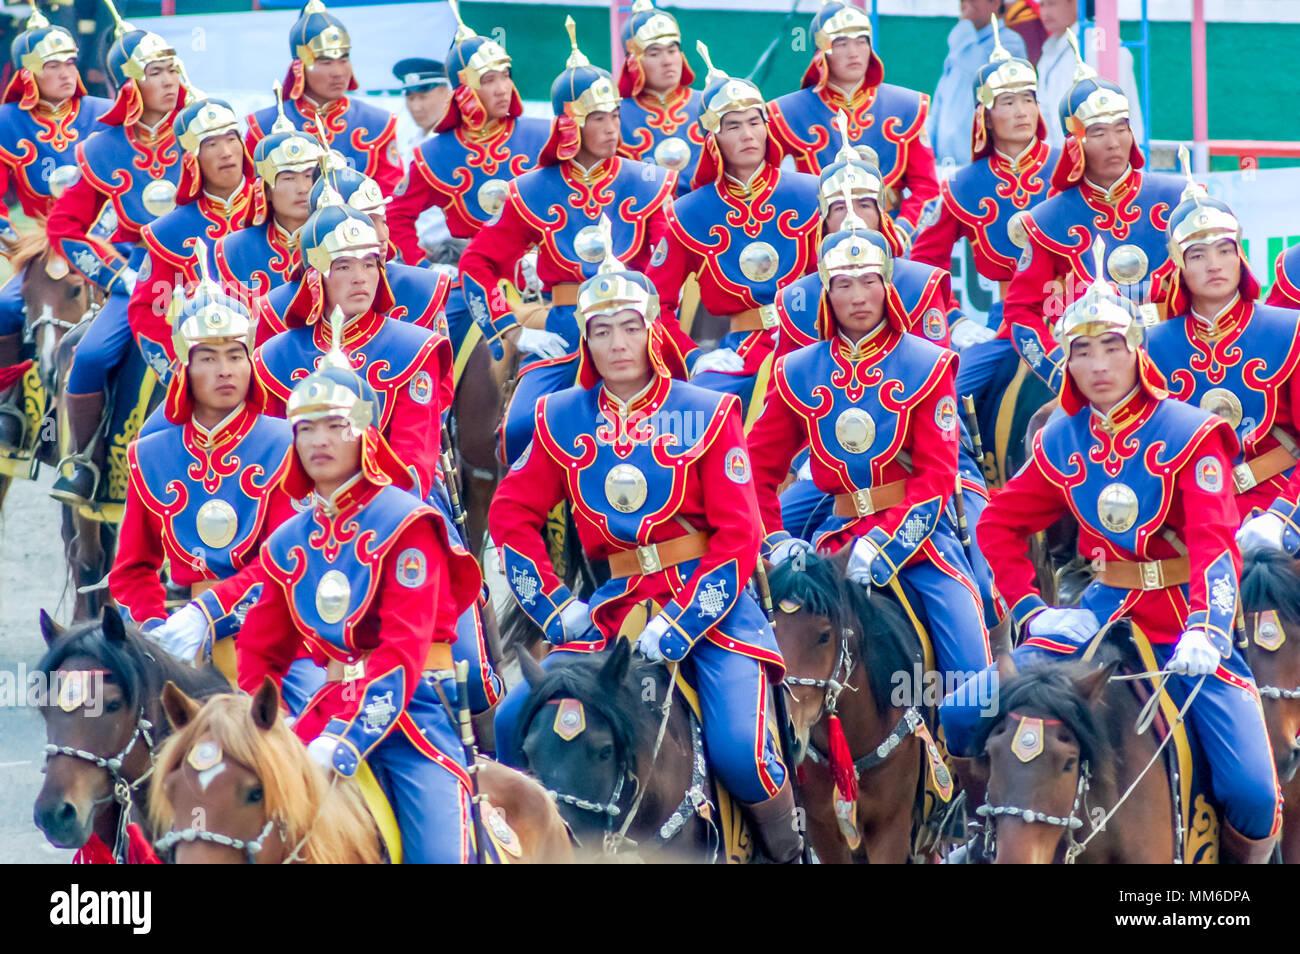 Ulaanbaatar, Mongolia - July 11, 2010: Uniformed horsemen in horseback riding display at Nadaam Opening Ceremony in capital Ulaanbaatar. - Stock Image